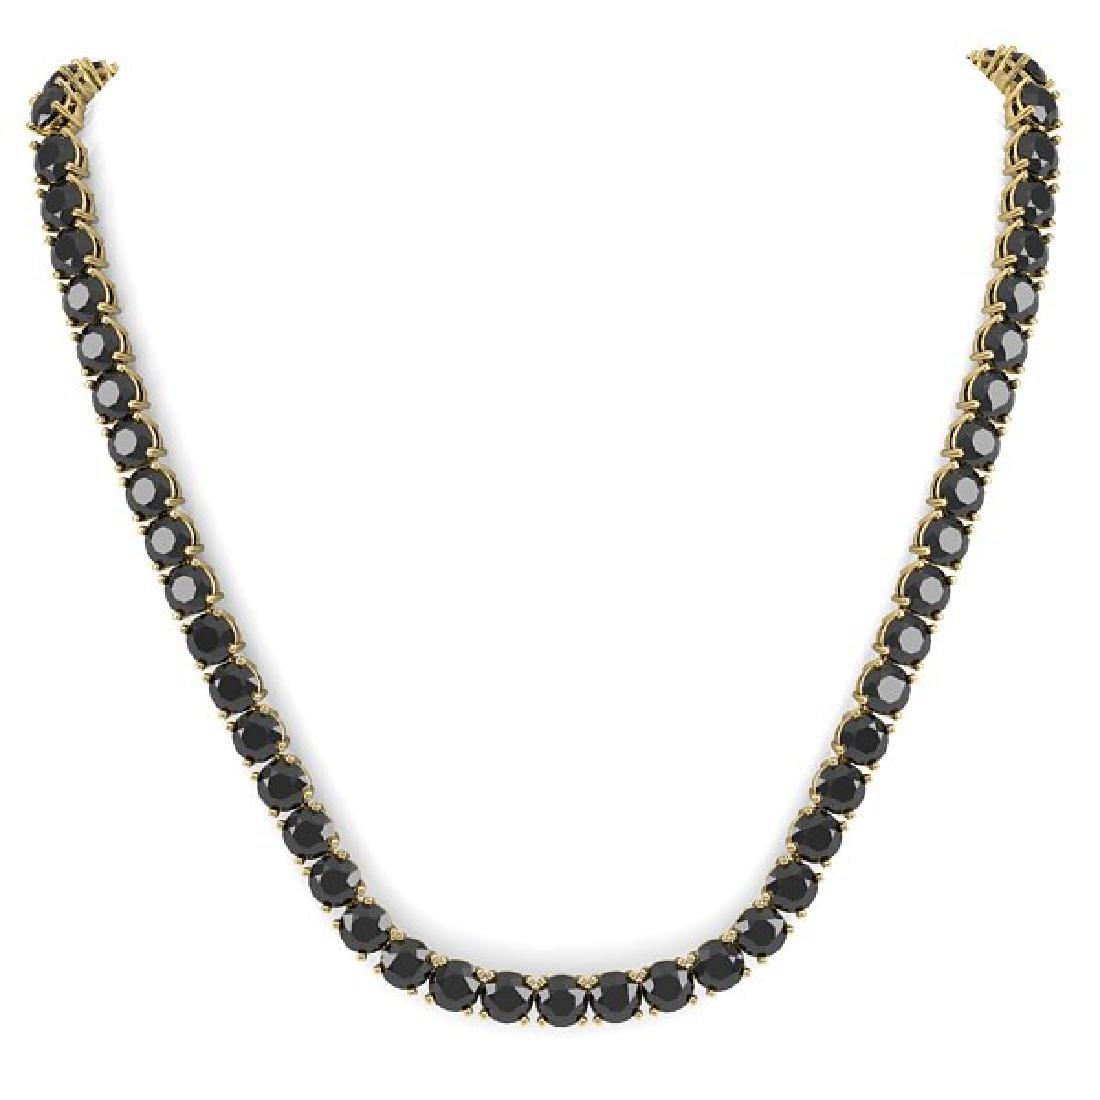 40 CTW Certified Black VS Diamond Necklace 18K Yellow - 3